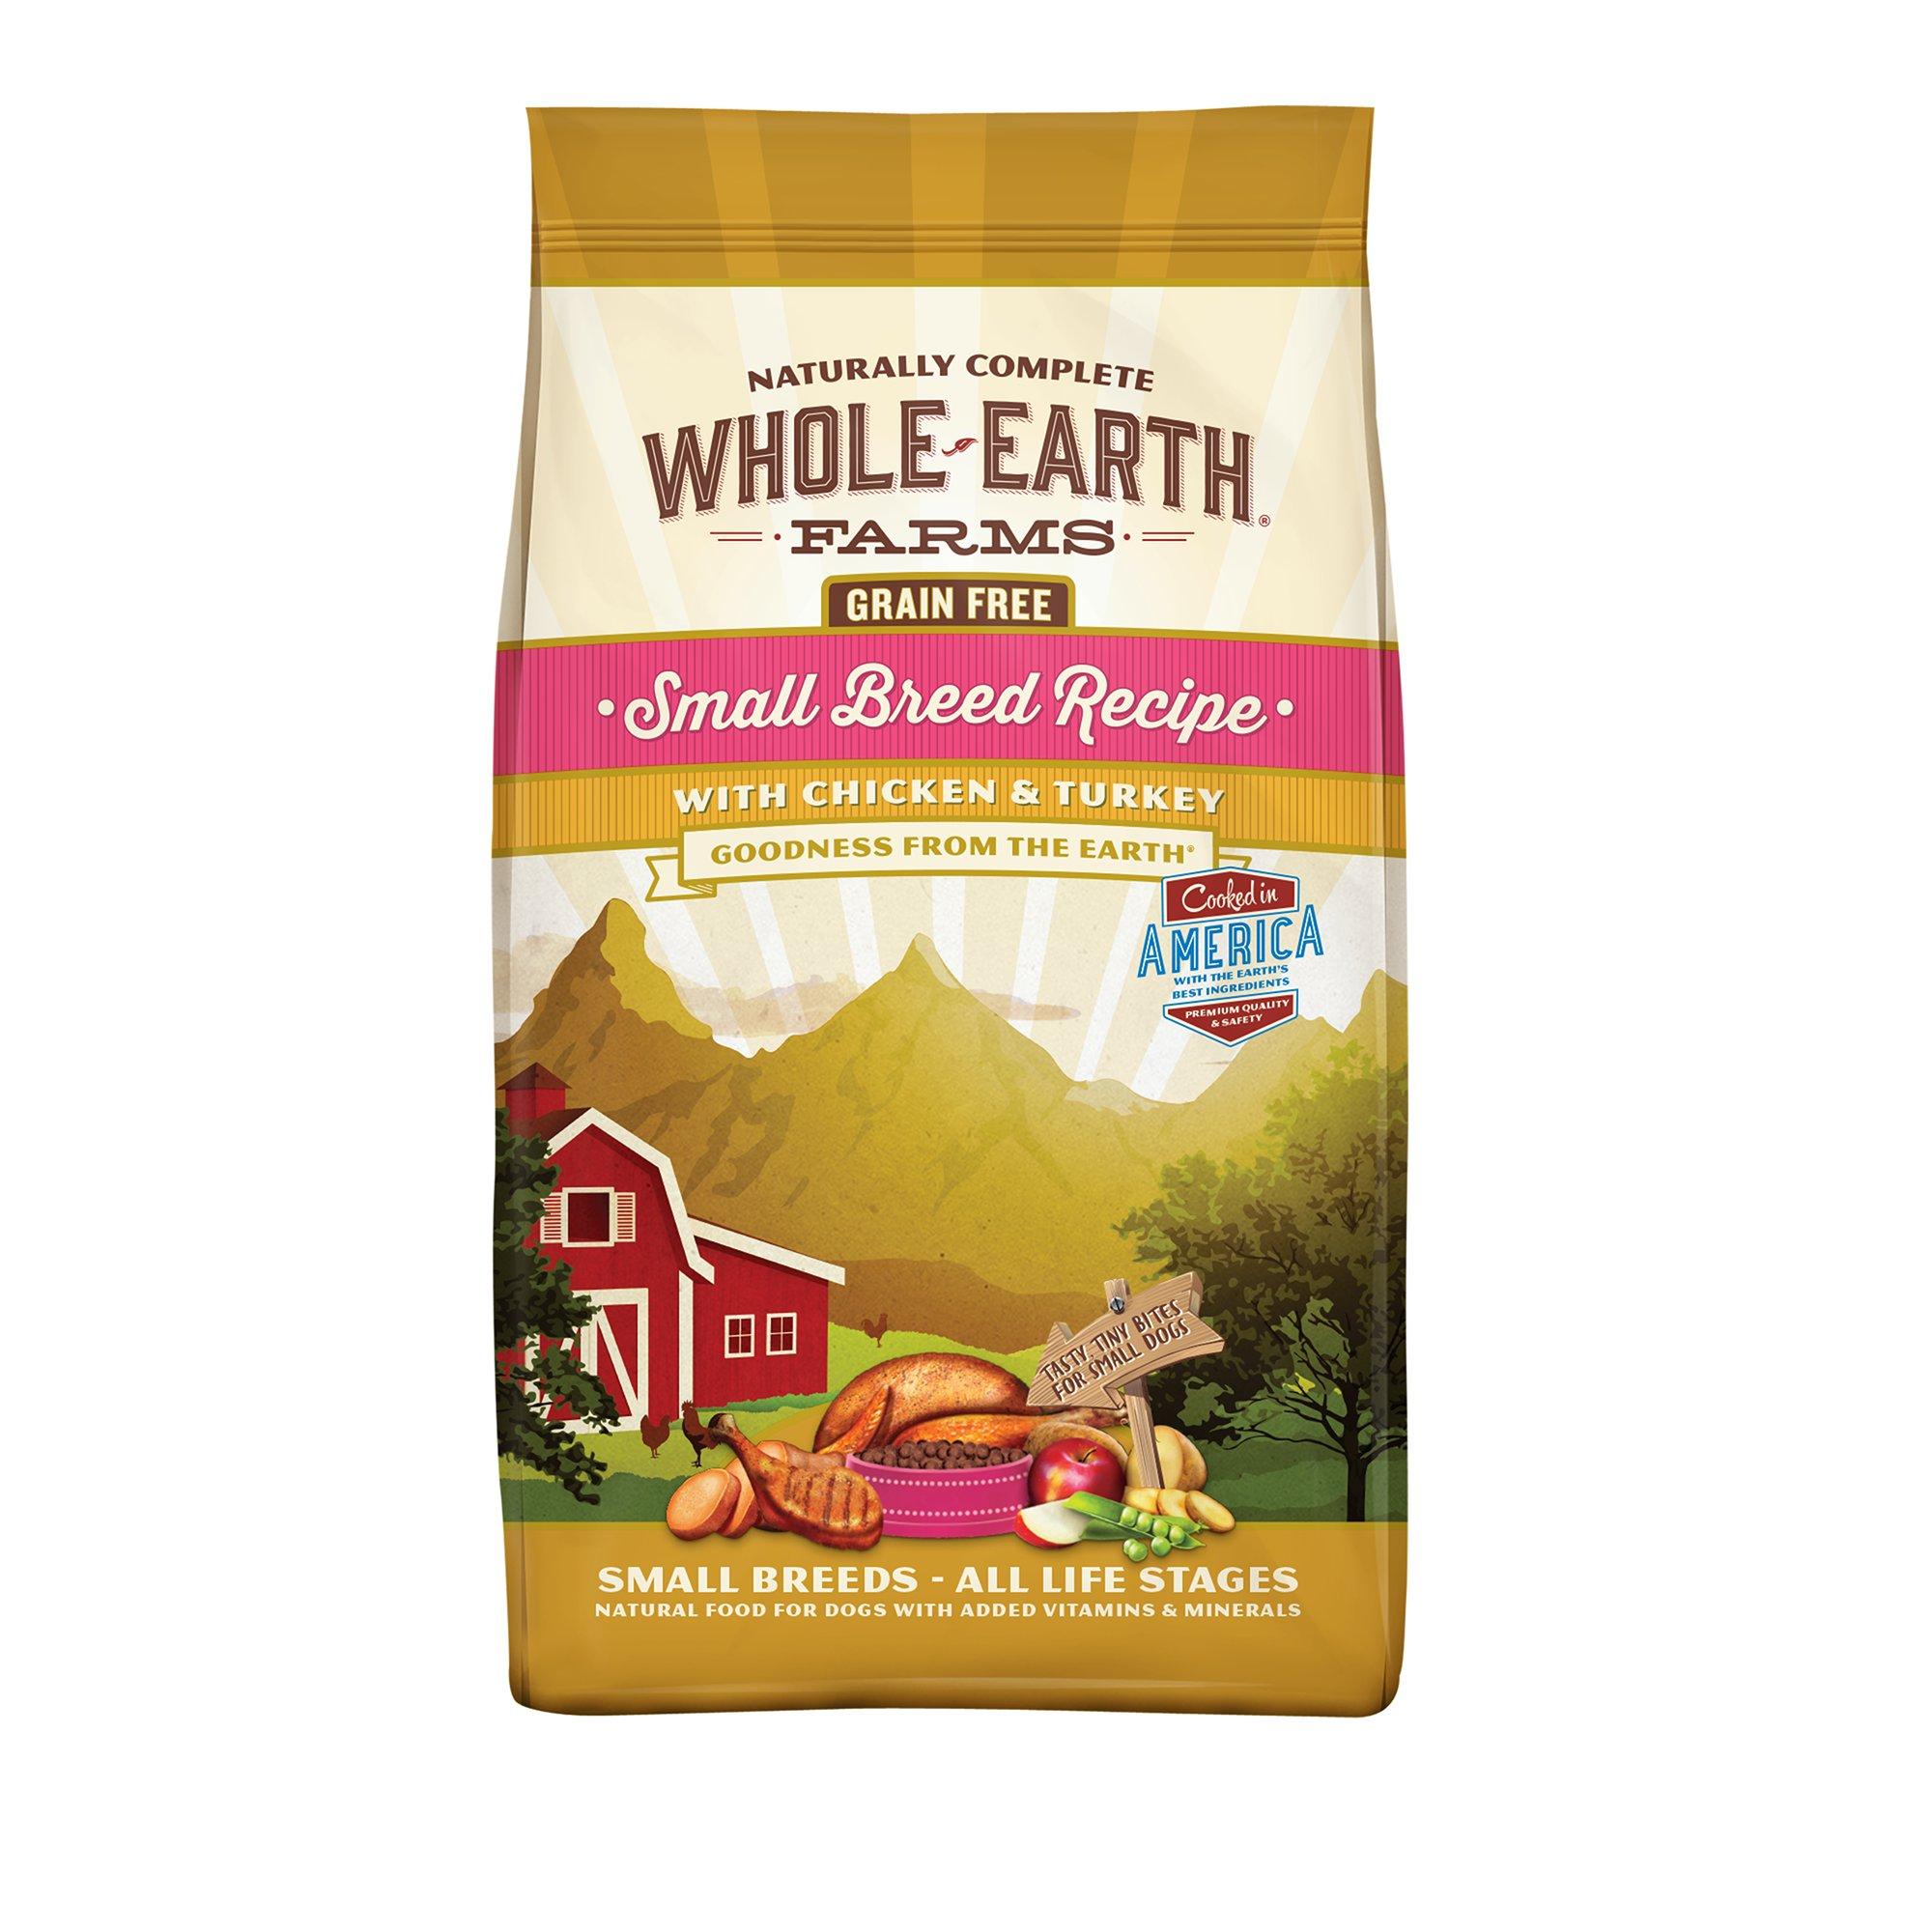 Whole Earth Farms Grain Free Small Breed Chicken & Turkey Dog Food